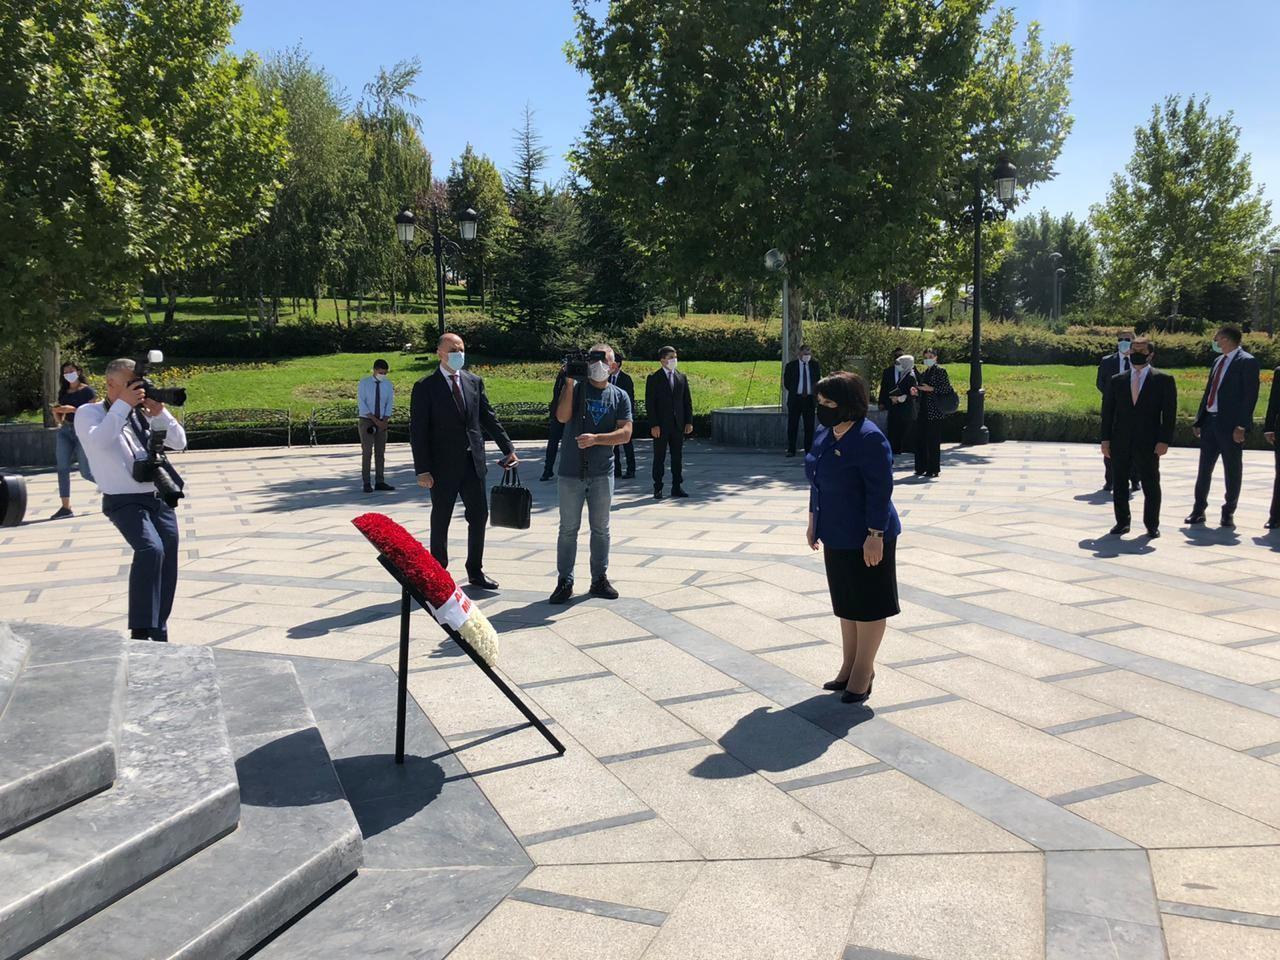 Парламентская делегация Азербайджана посетила парк Гейдара Алиева в Анкаре